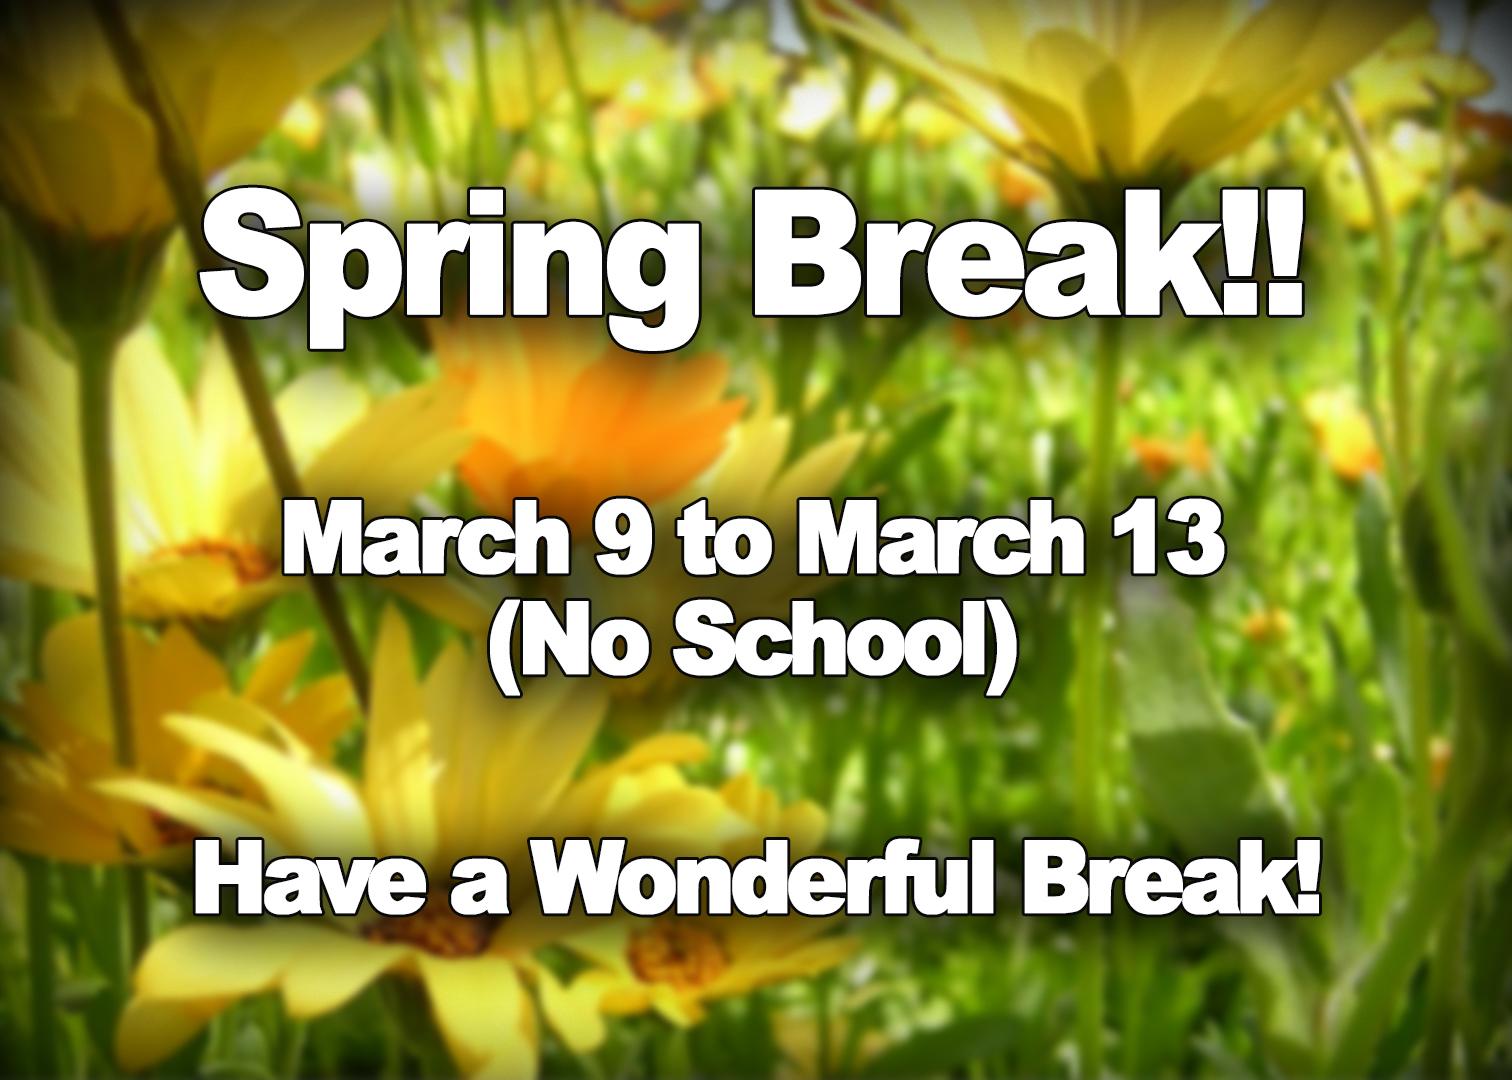 Spring Break!! March 9 to March 13 (No School). Have a wonderful break!